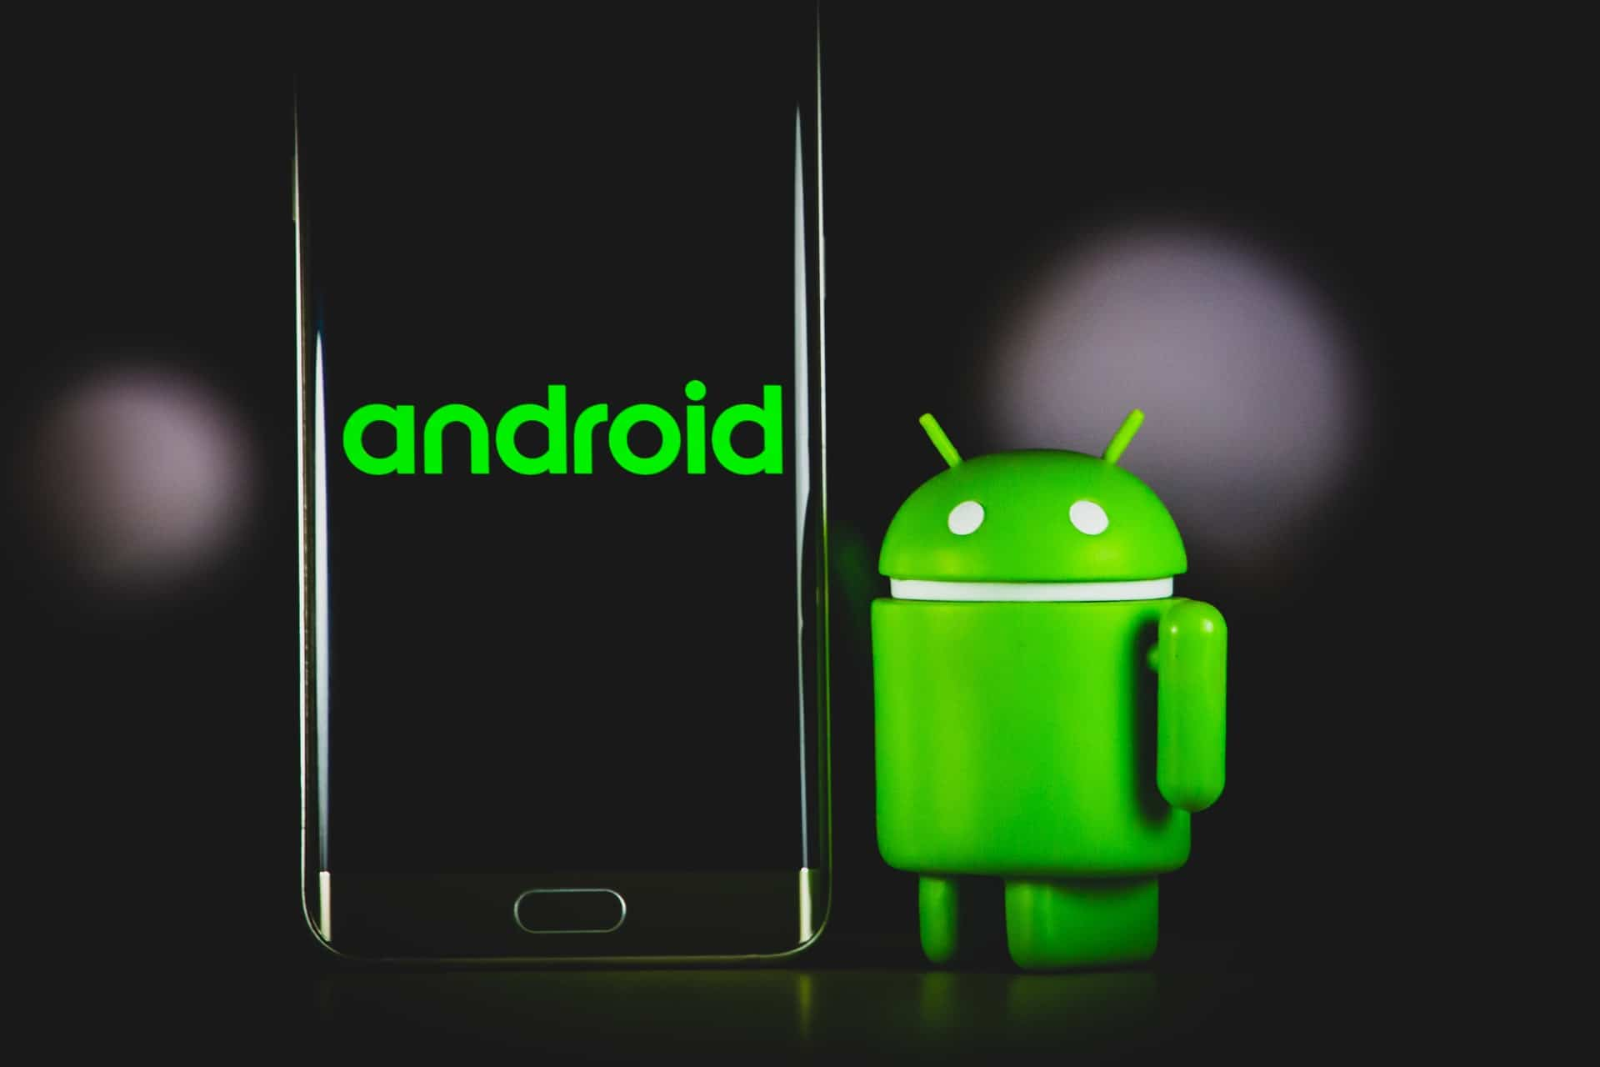 vieux-smartphones-android-plus-connecter-compte-google